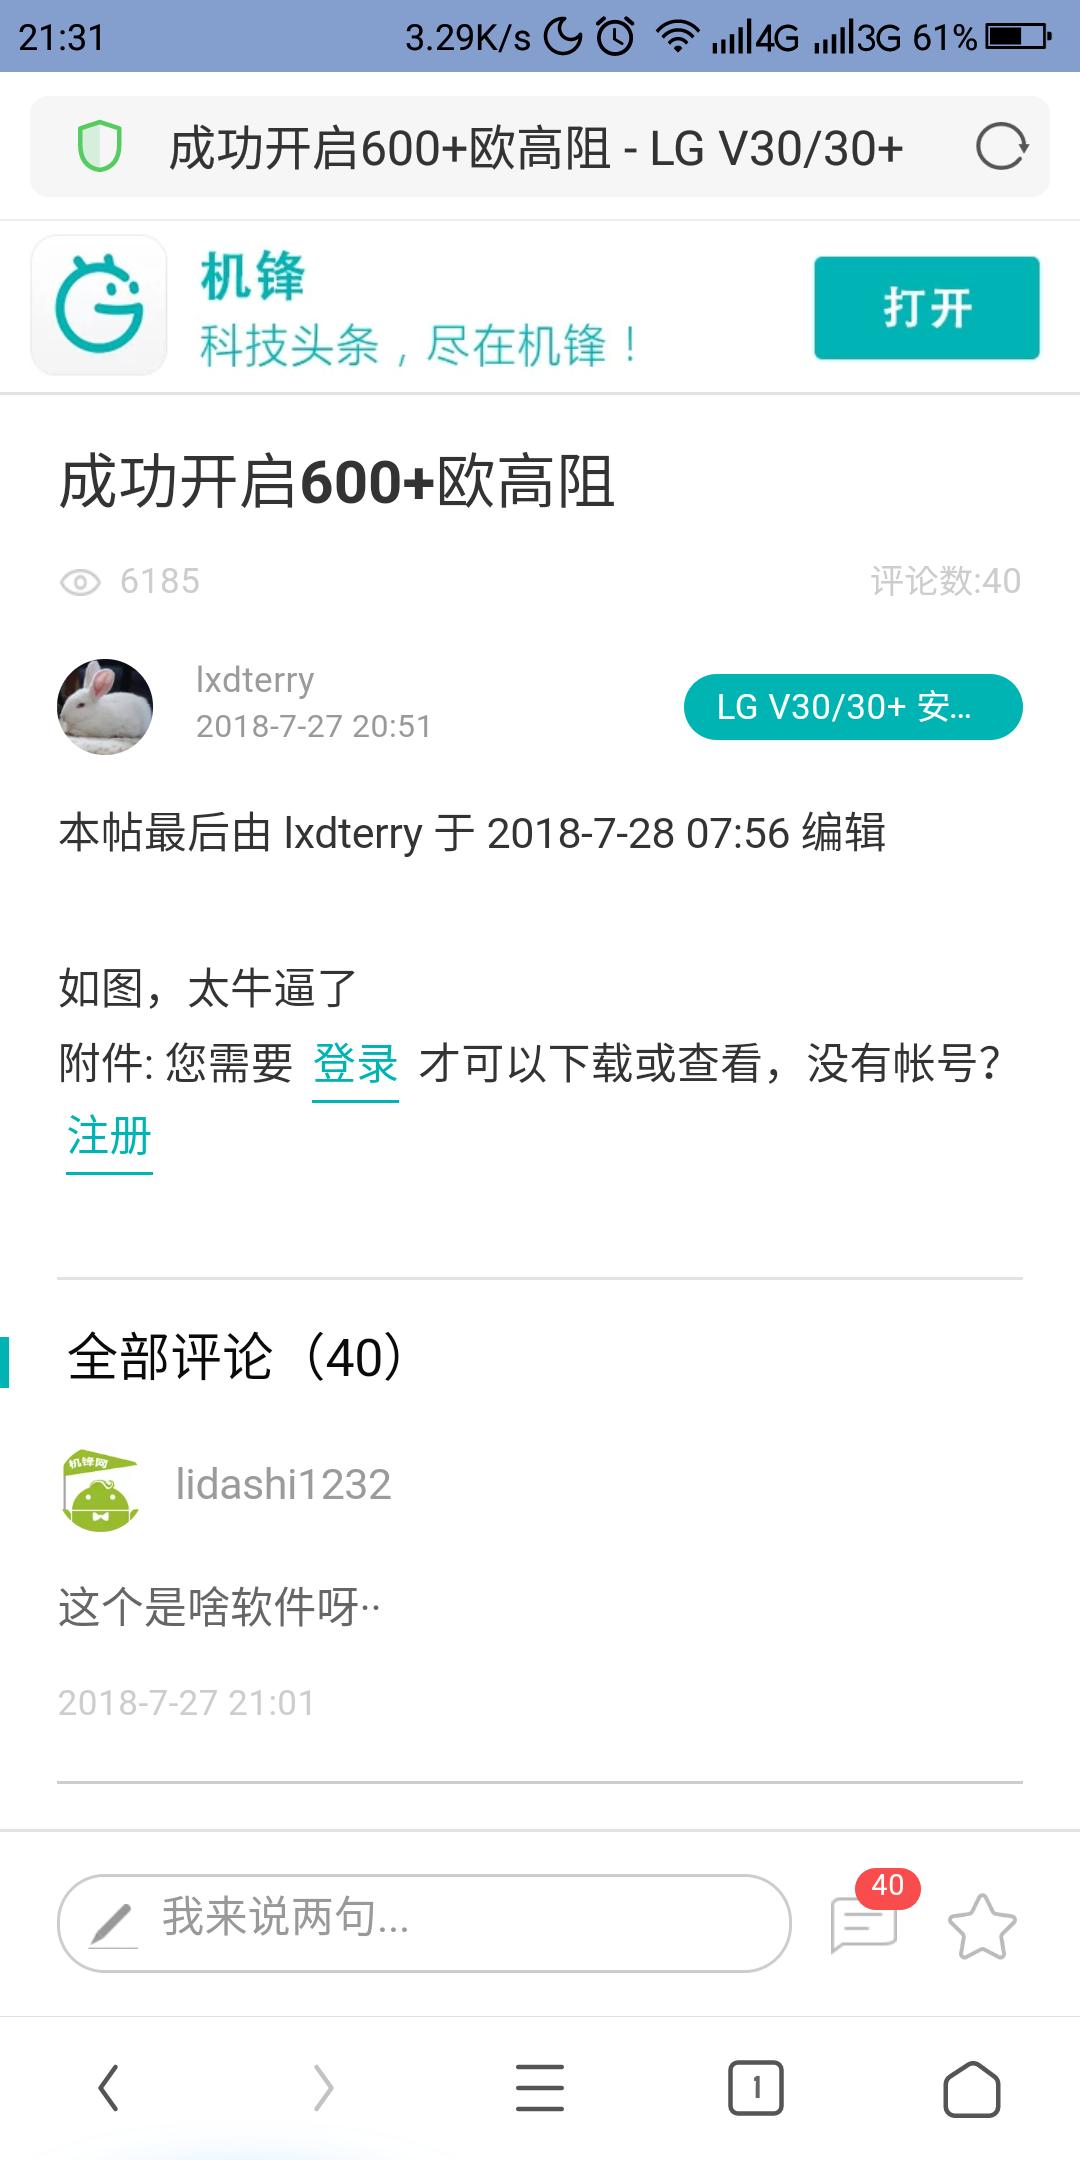 Screenshot_2018-12-14-21-31-24.png